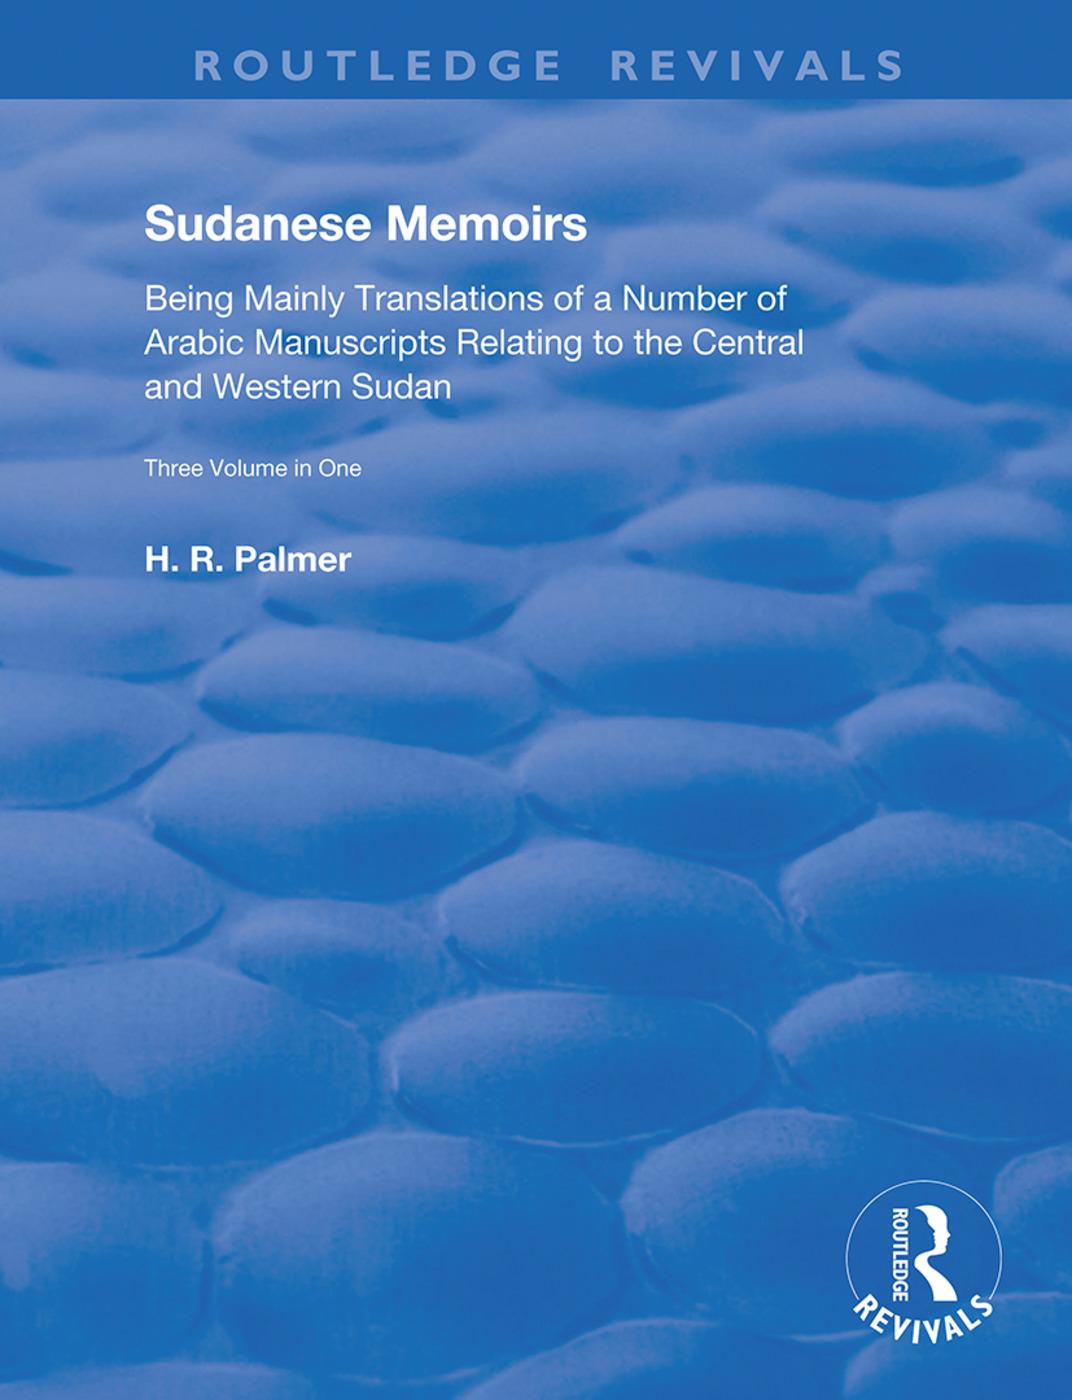 Sudanese Memoirs: Template Subtitle book cover